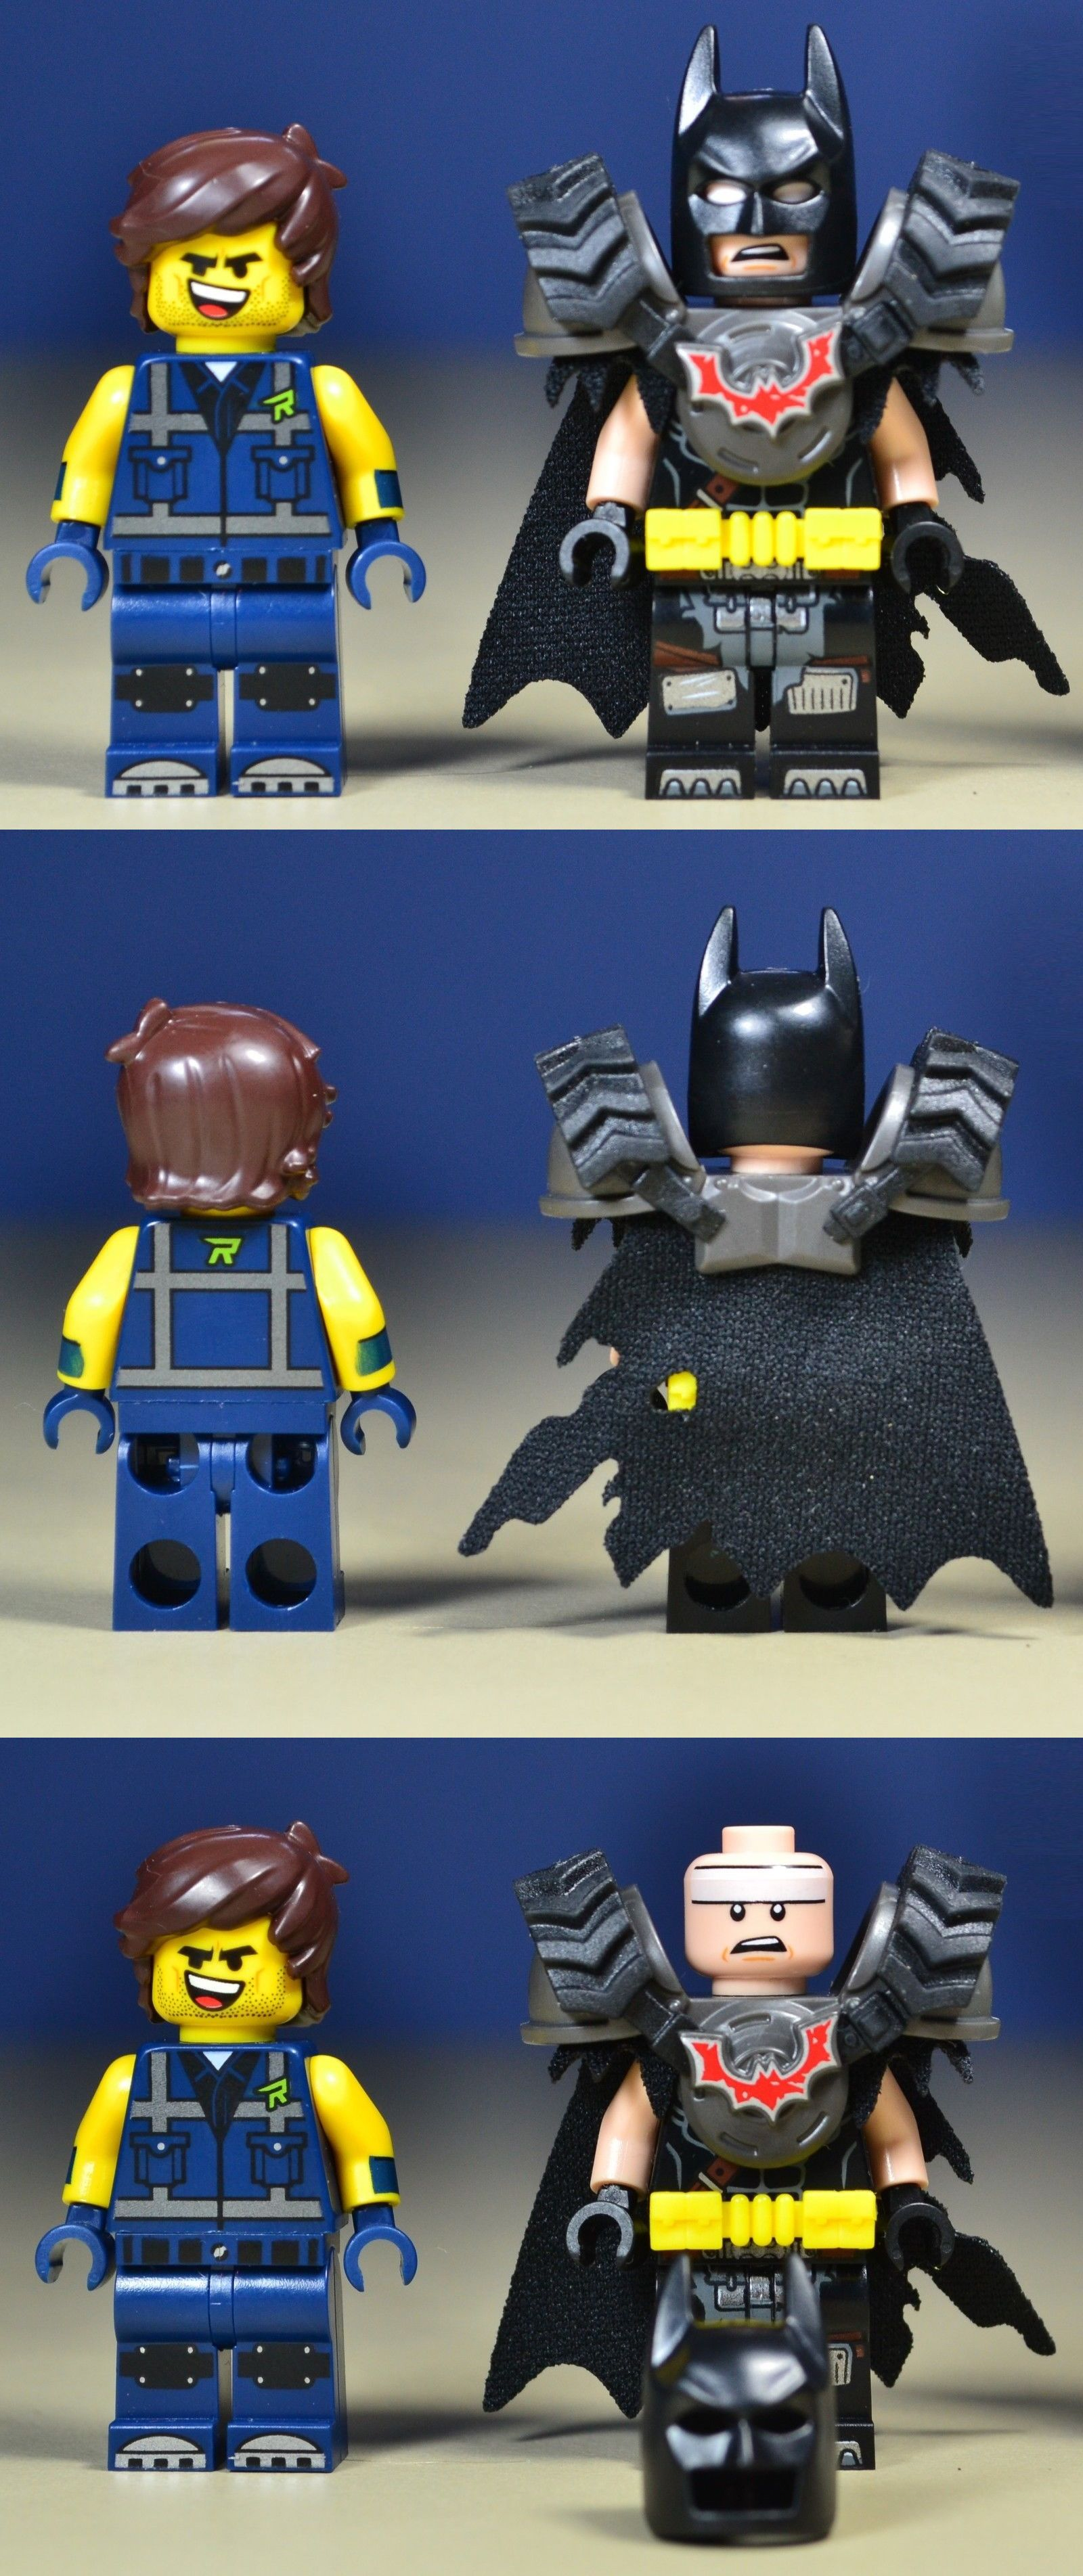 Building Toys 183446 Lego The Lego Movie 2 Batman And Rex